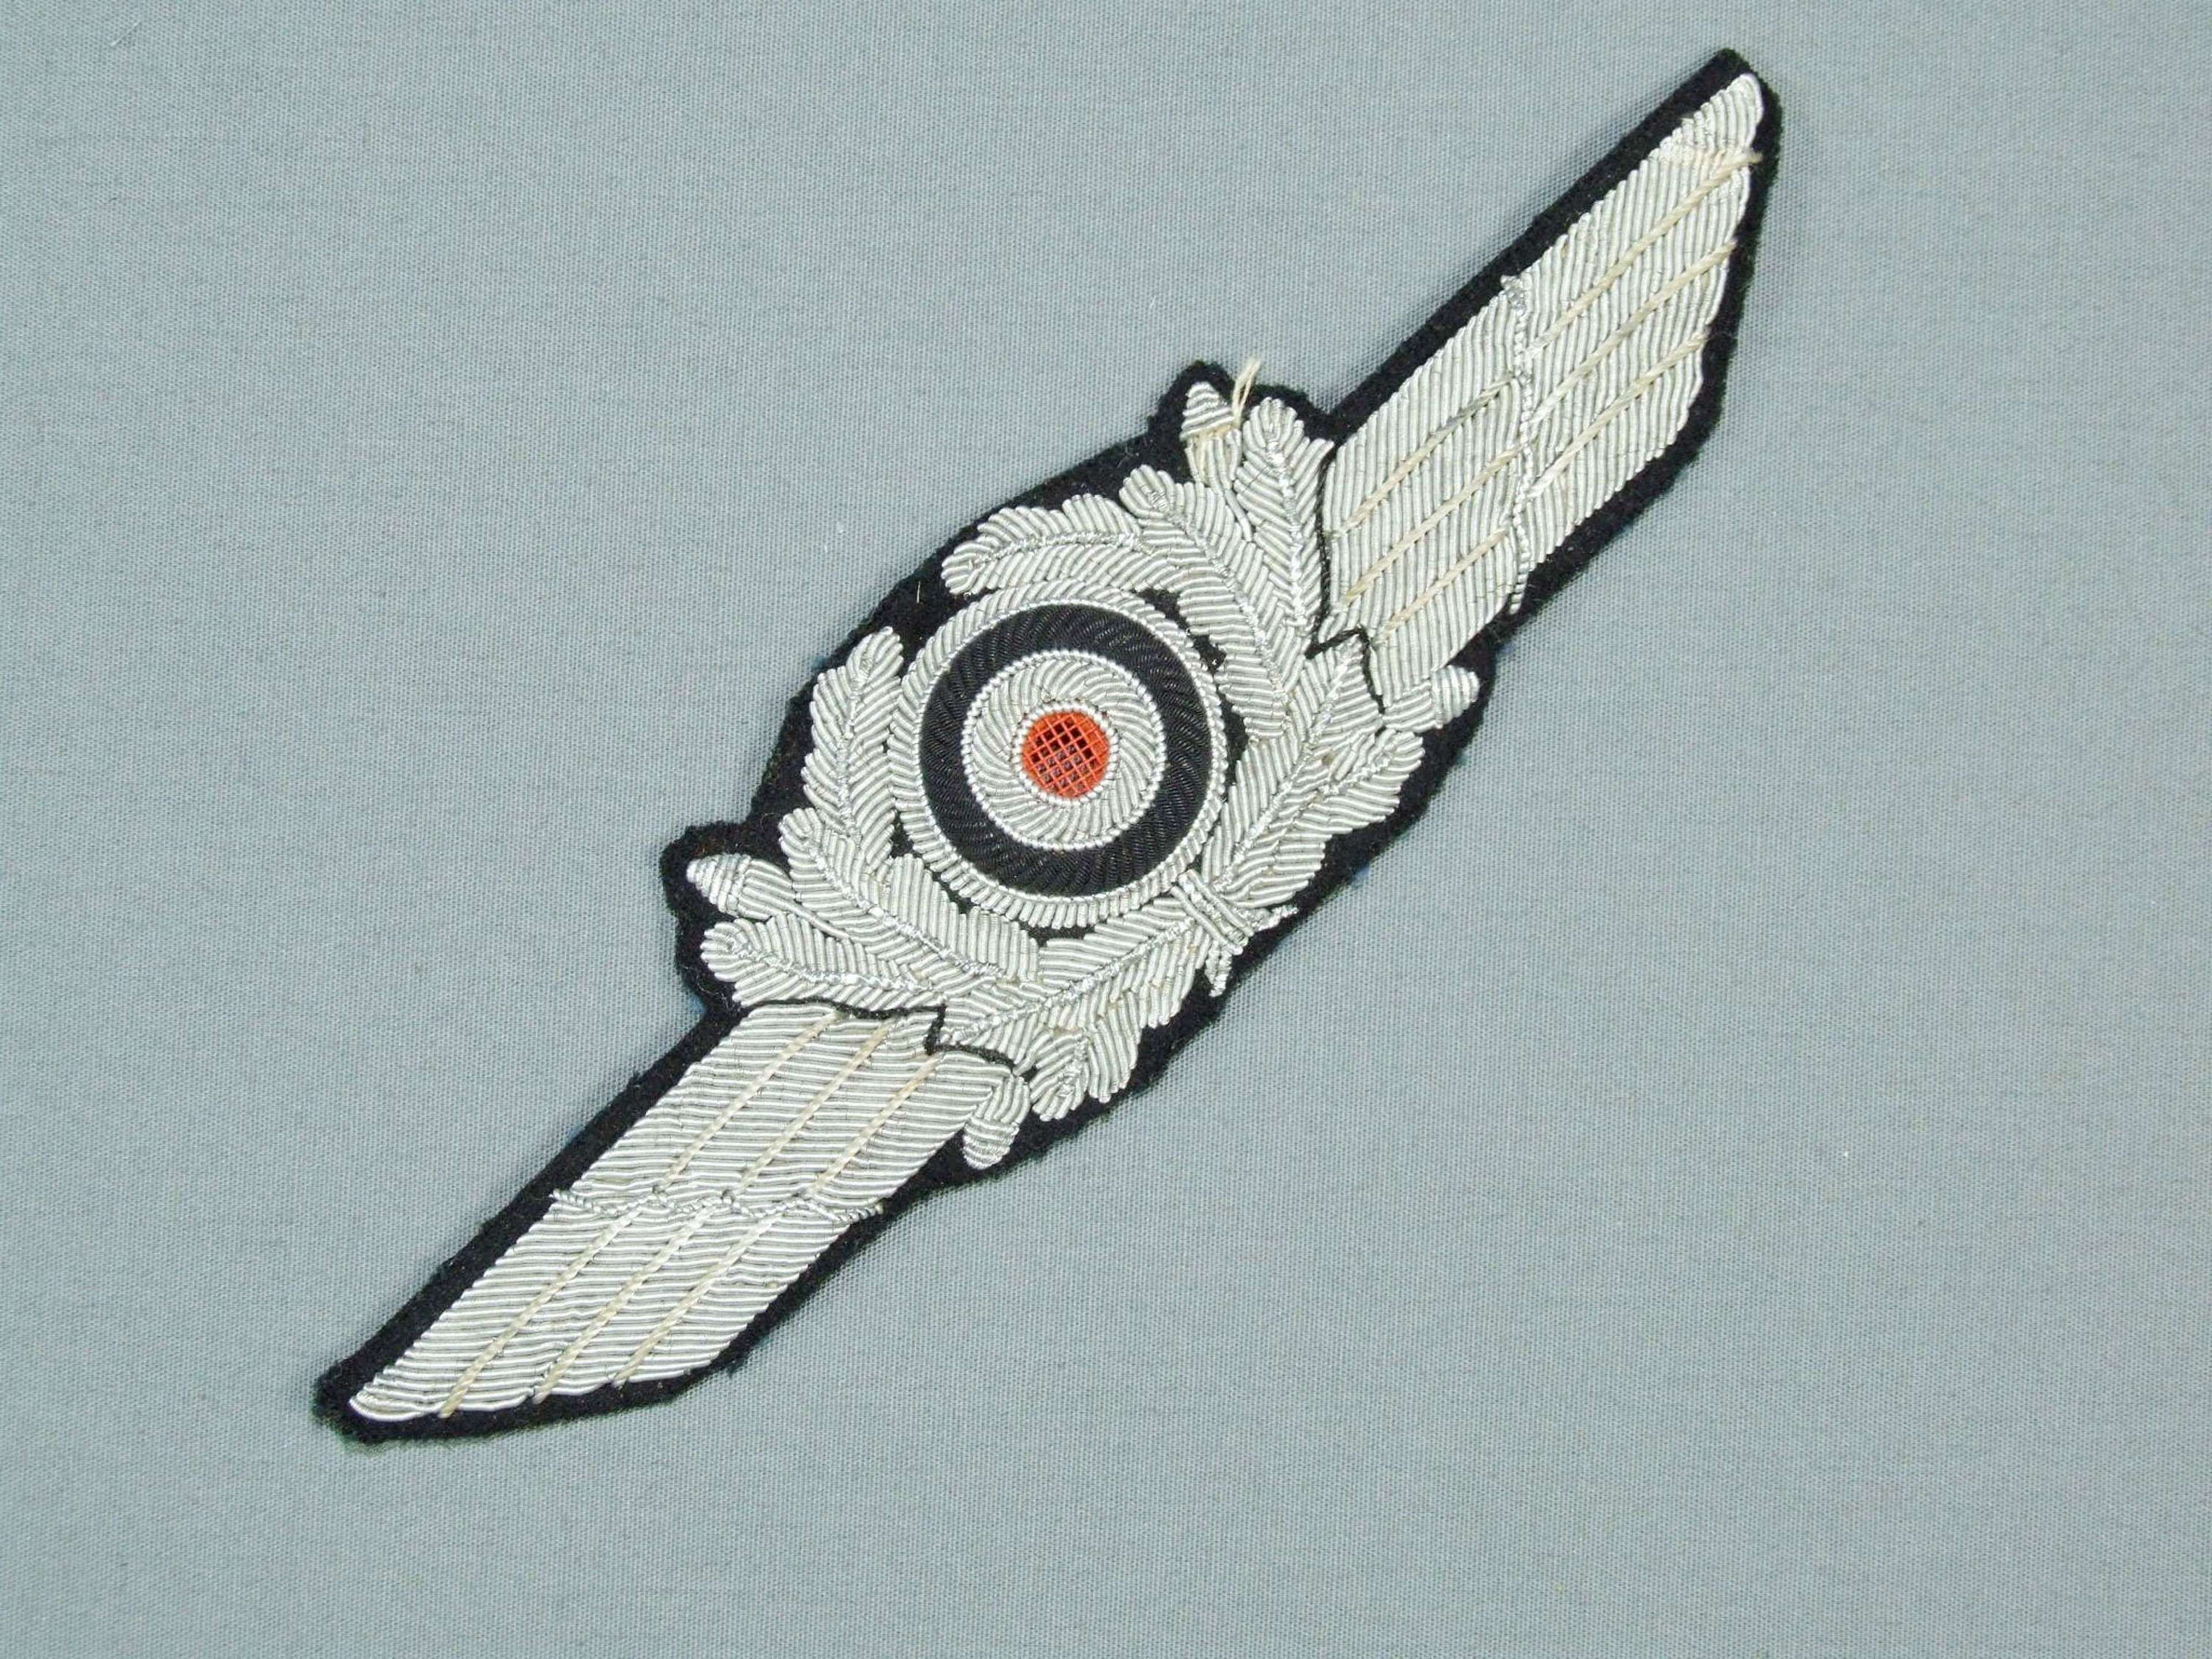 Luftwaffe Officer's Cap Cockade. Ventilated Erel